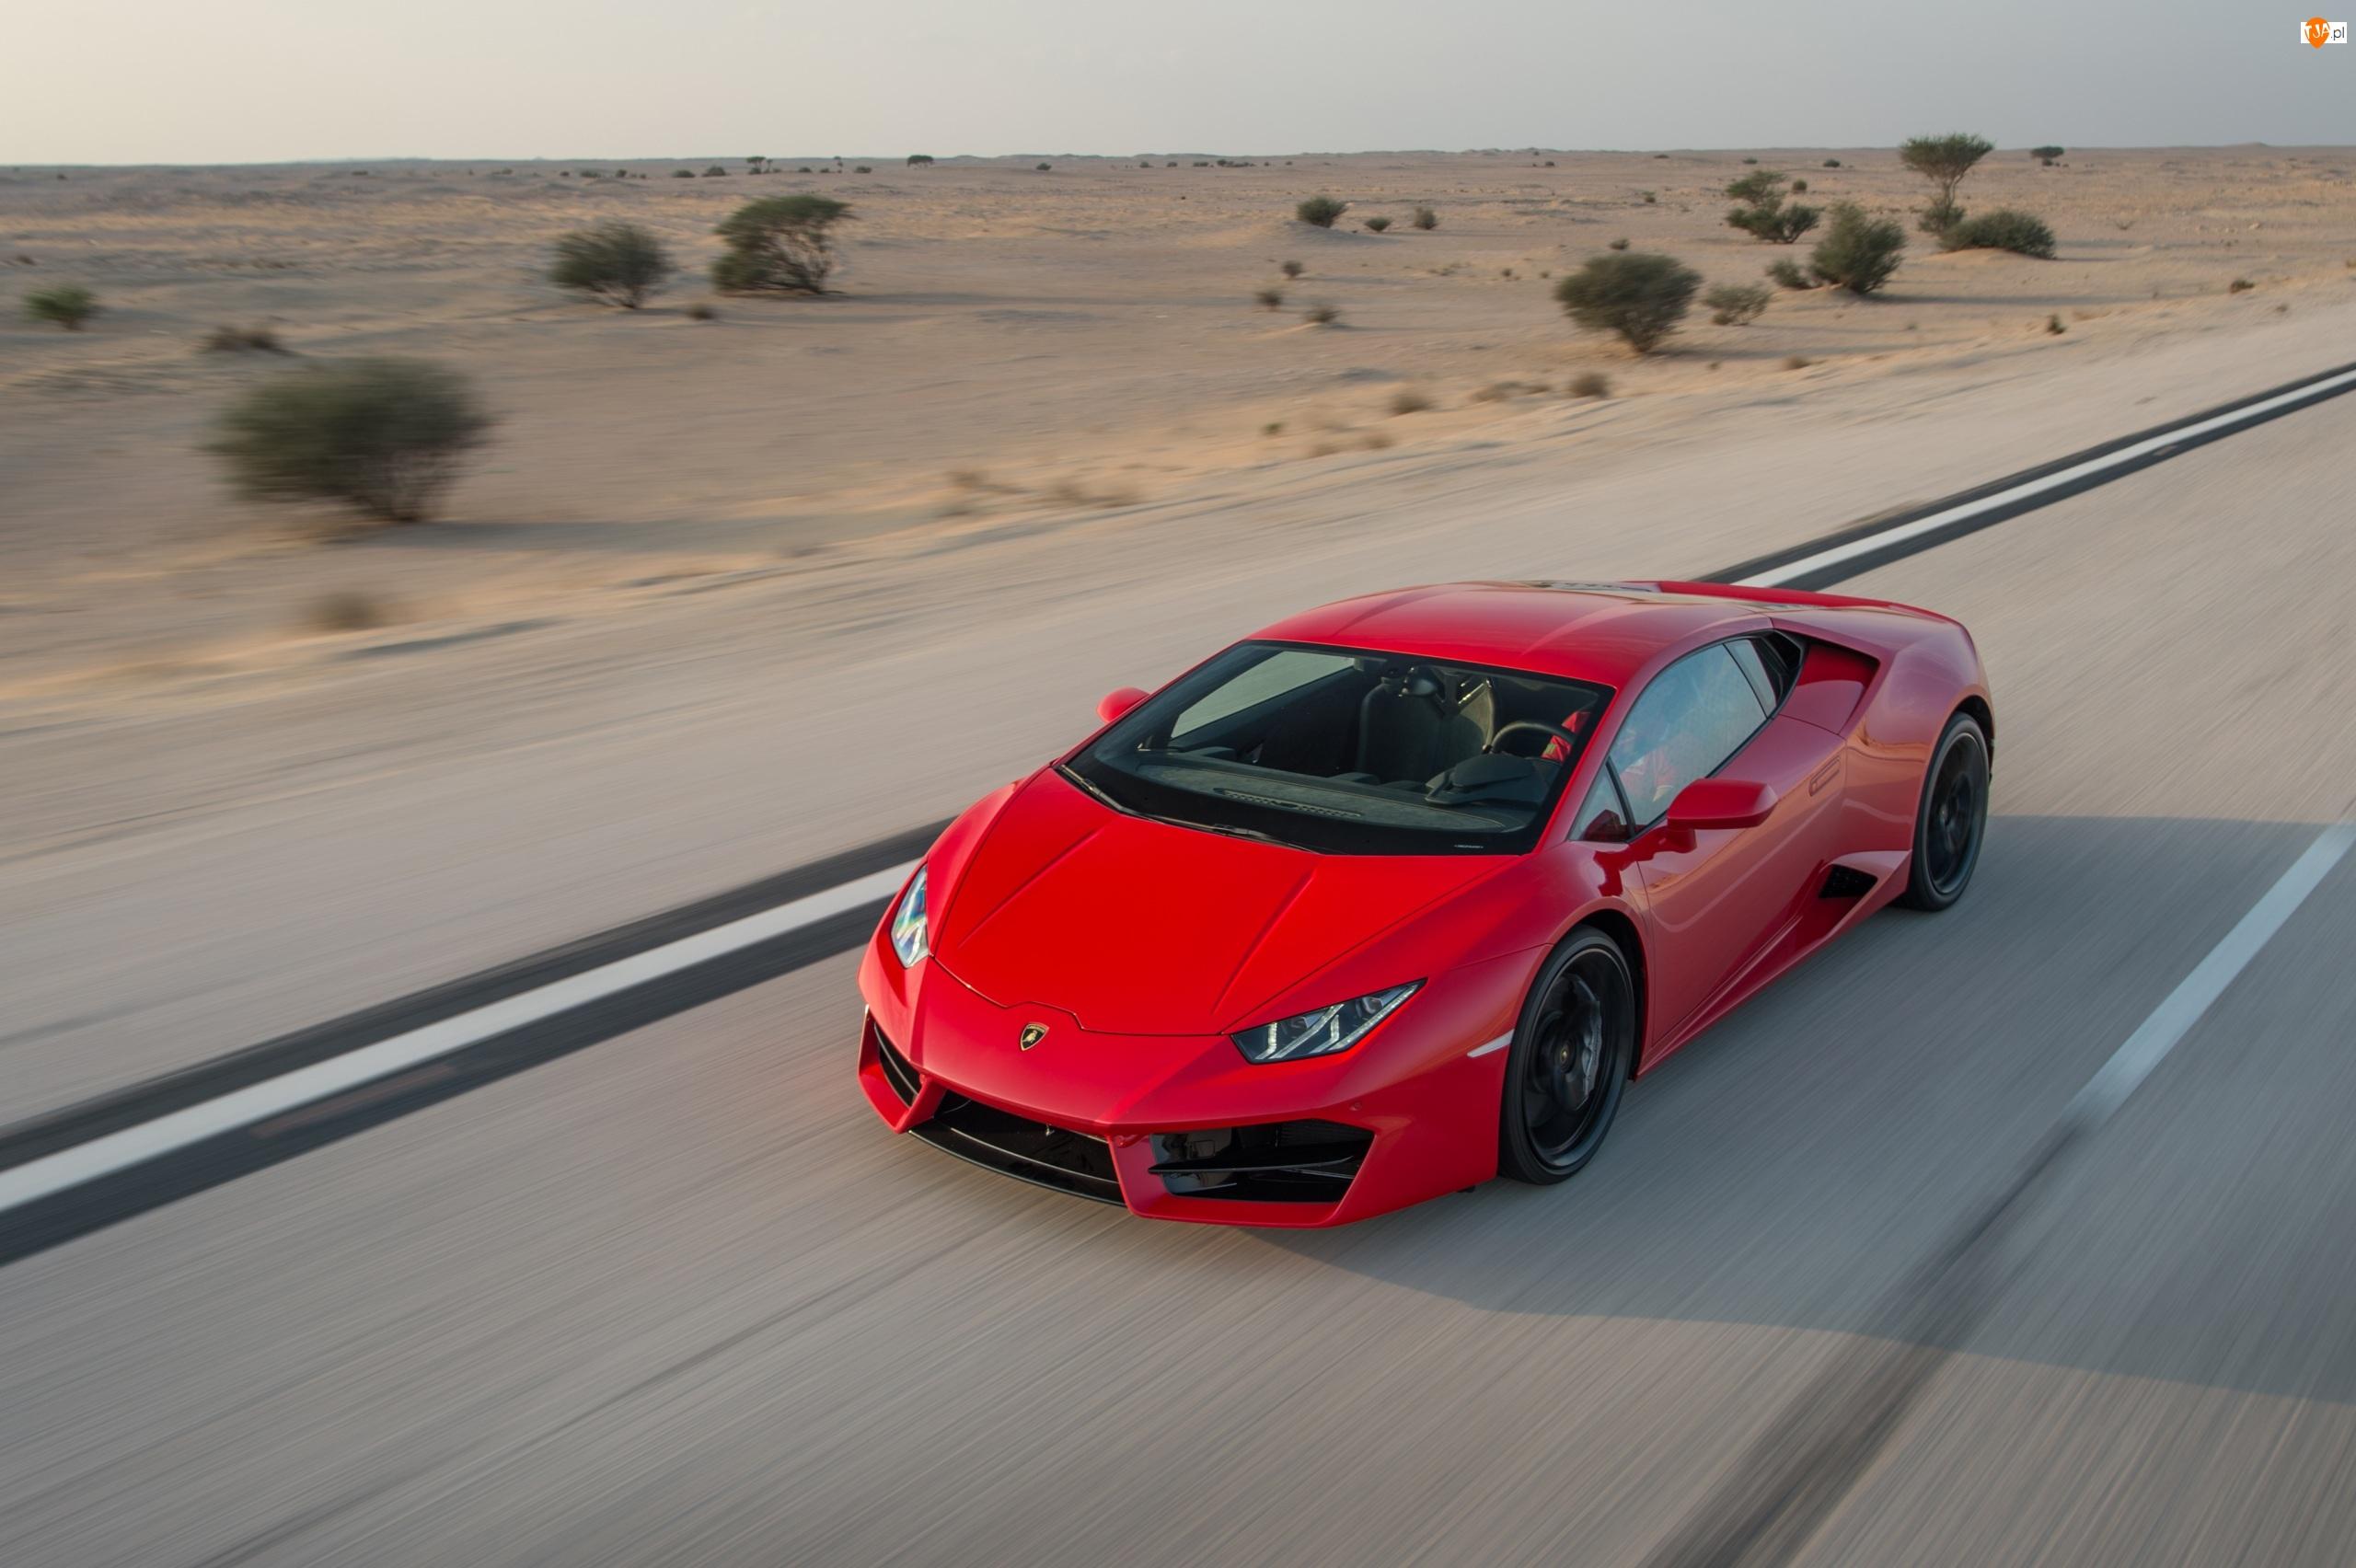 2016, Czerwone, Lamborghini Huracan LP 580-2